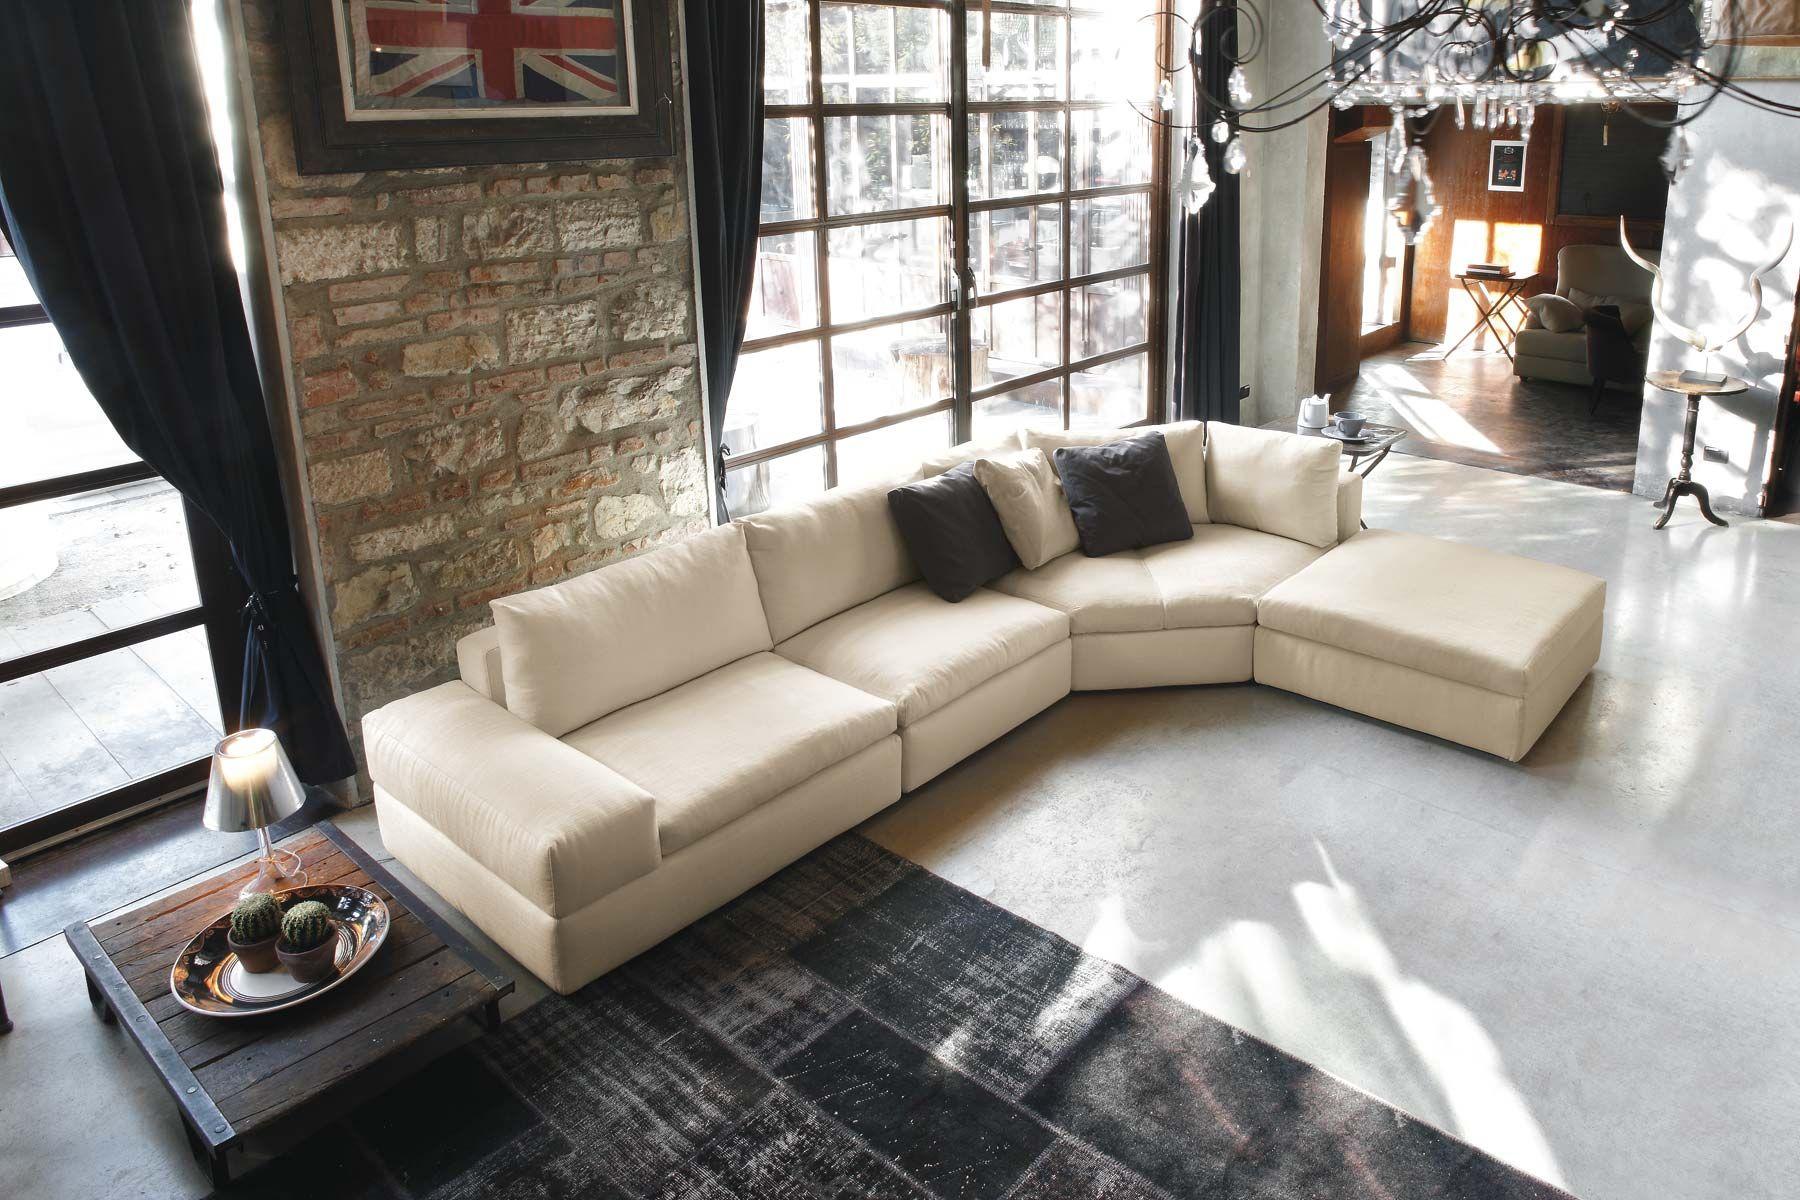 Musa spa divani e poltrone sofas and armchairs smart sofas sofa modular sofa corner sofa - Salon poltron et sofa ...